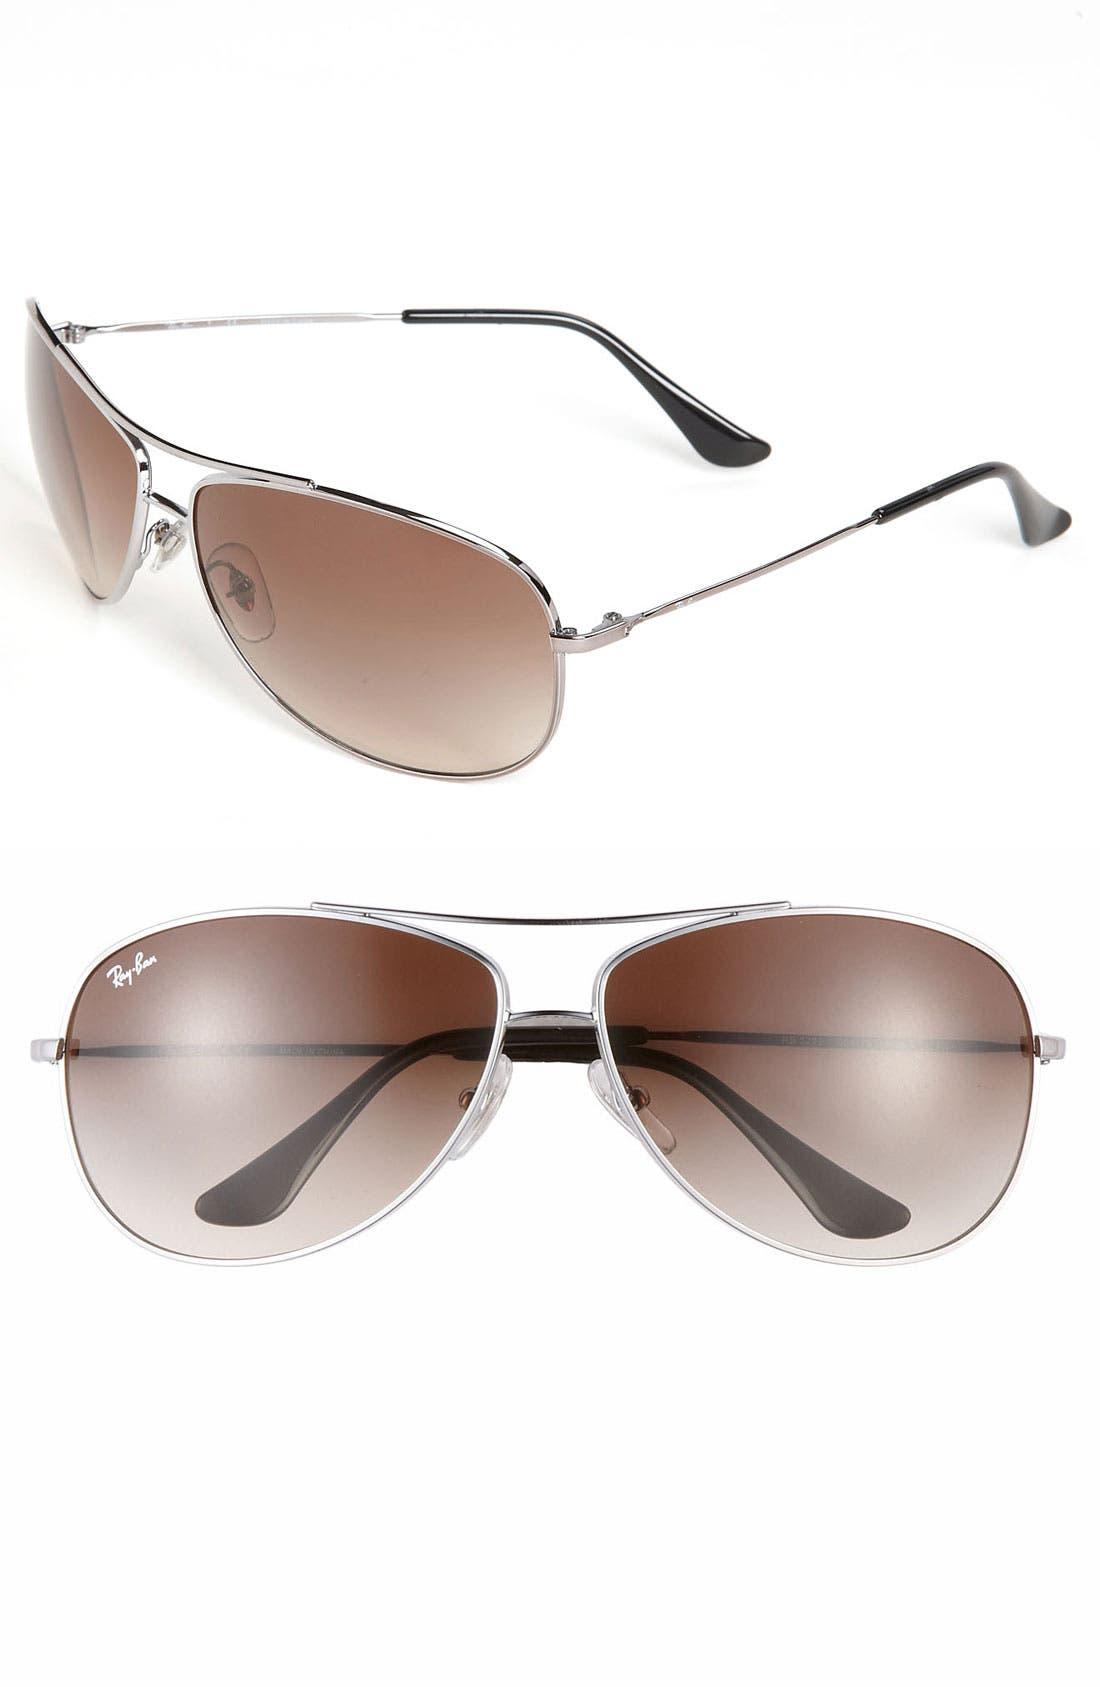 Alternate Image 1 Selected - Ray-Ban 'Wayfarer' 51mm Sunglasses